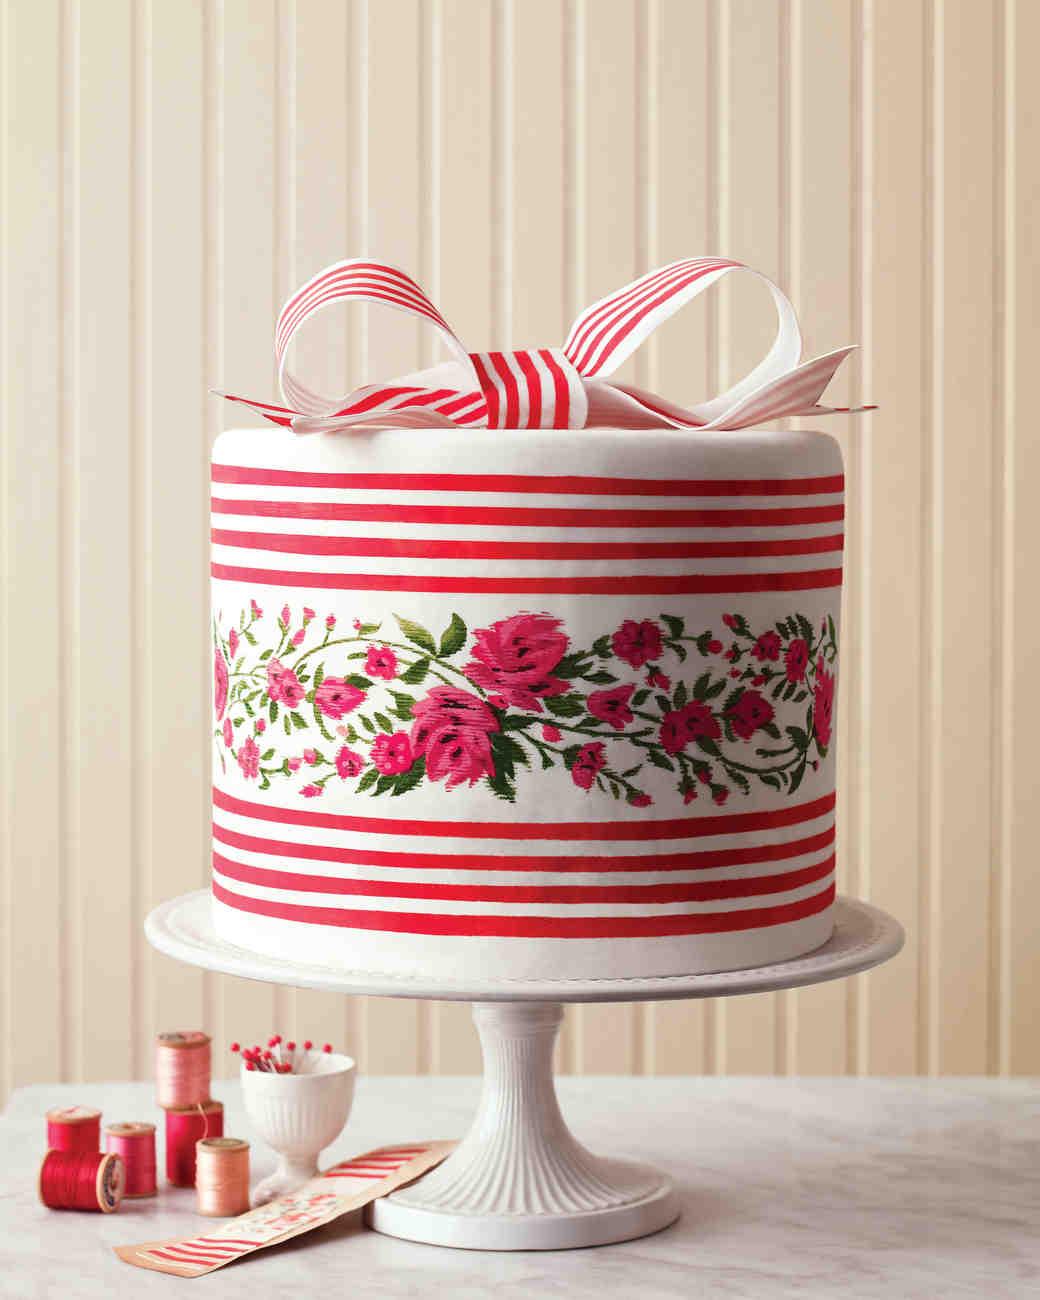 bow-cakes-mld105426-ikat-0515.jpg